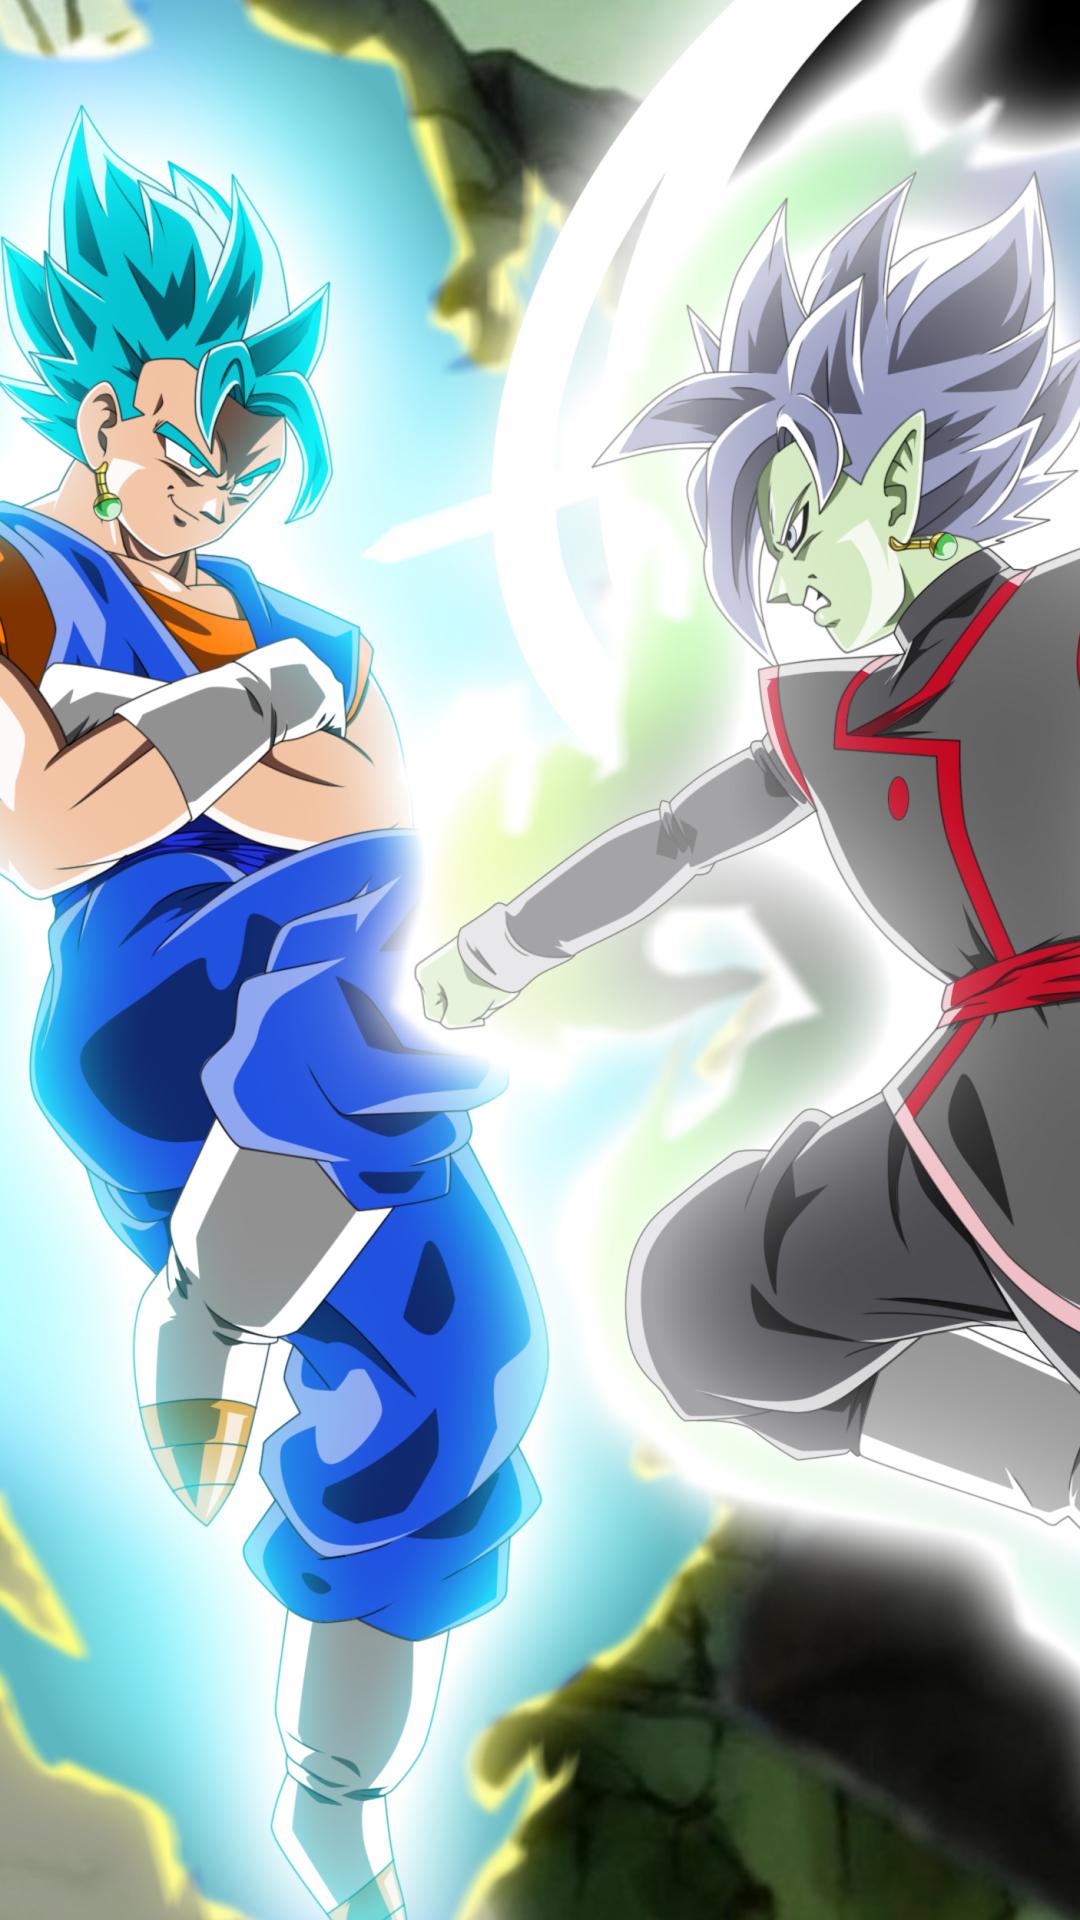 Anime dragon ball super 1080x1920 wallpaper id 682014 mobile abyss - Dragon ball super wallpaper 1080x1920 ...